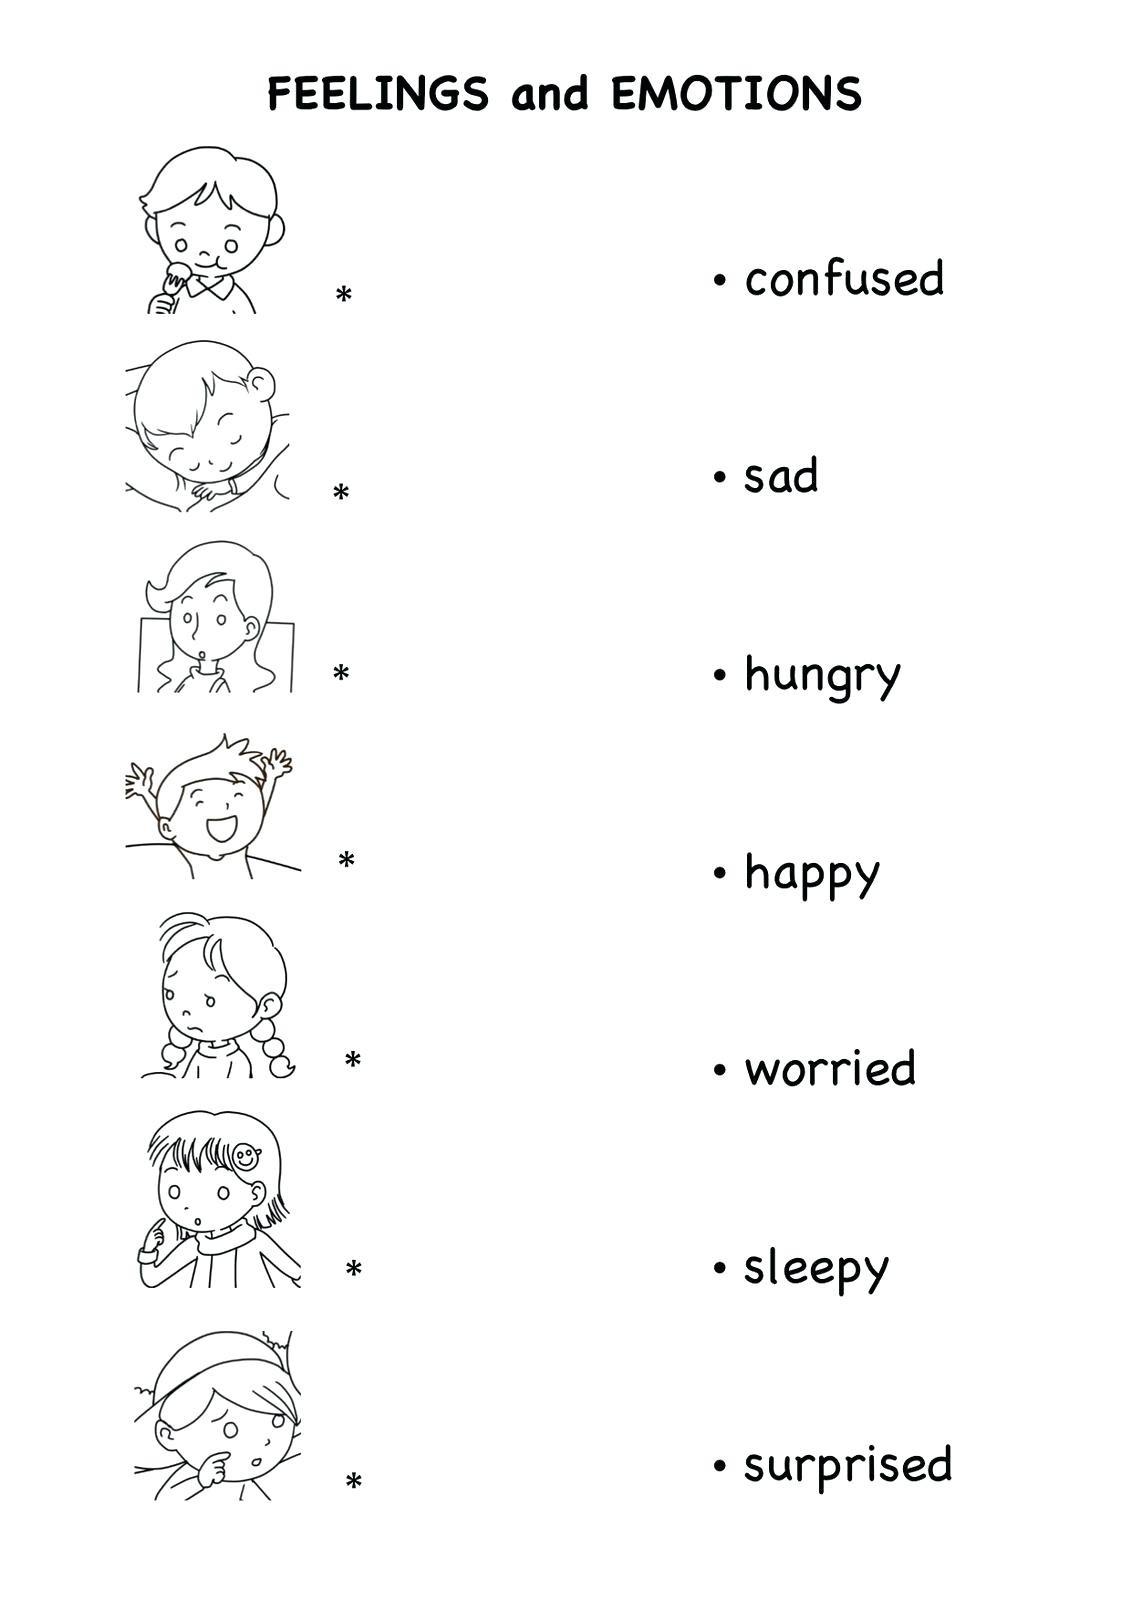 Emotions Worksheets for Preschoolers Preschool Emotions Worksheet Clover Hatunisi